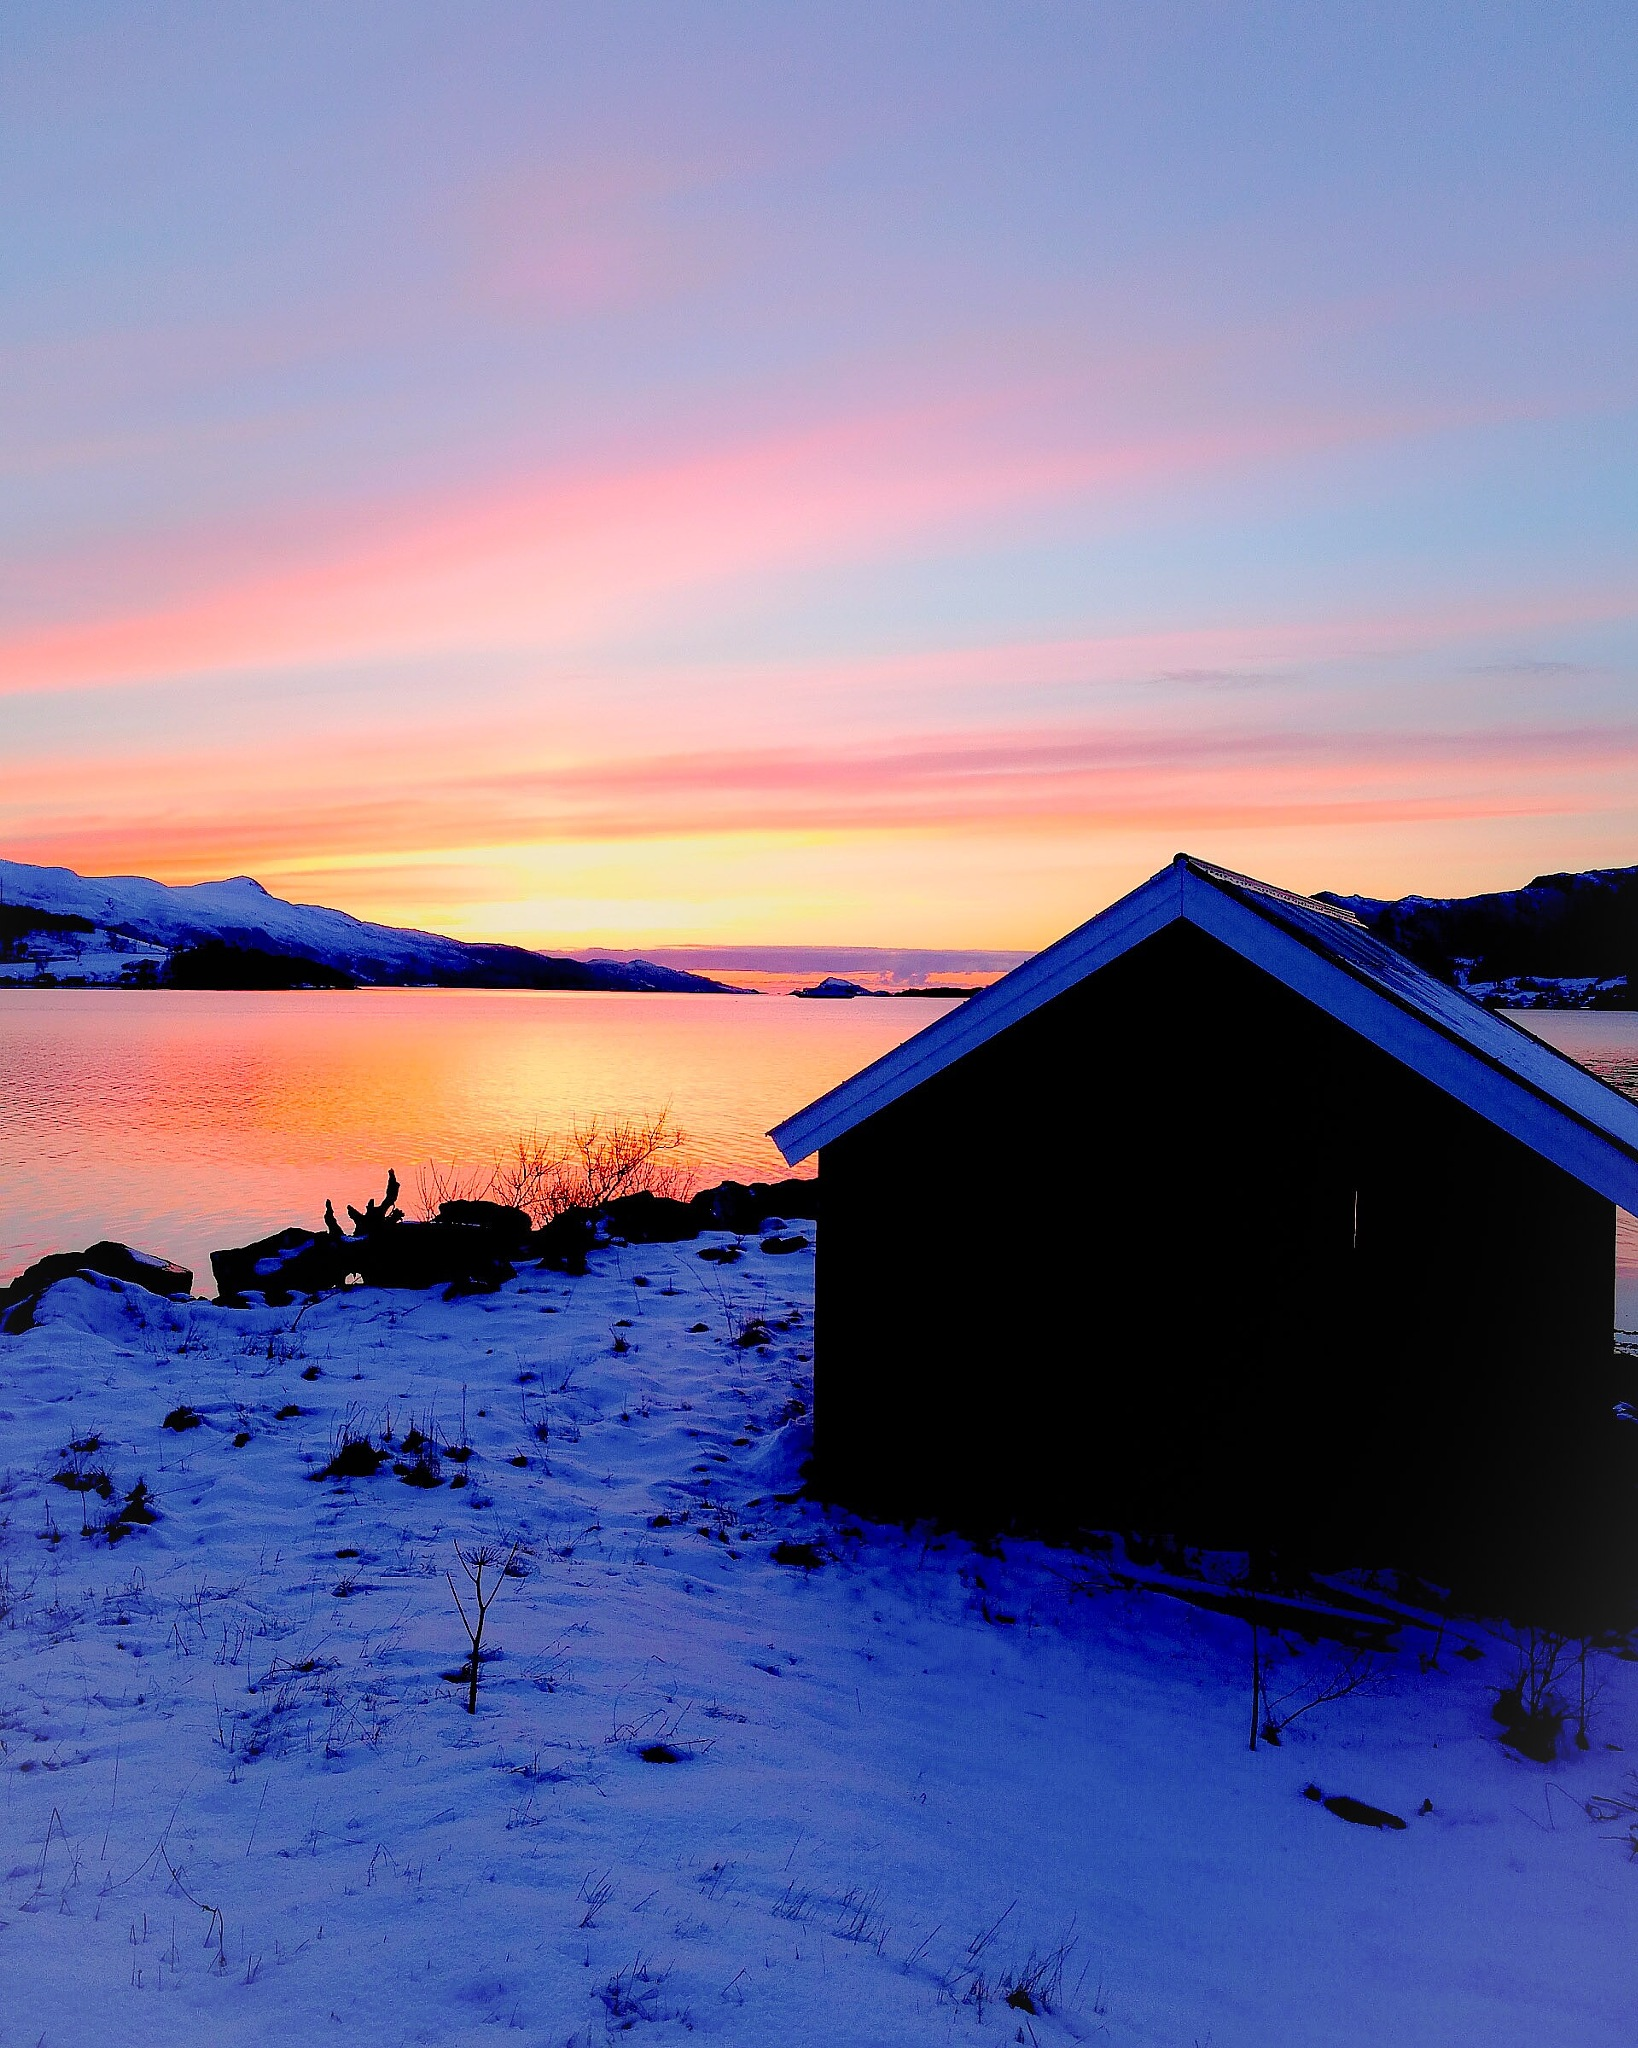 Sunset in march  by Anne Grethe Eikrem